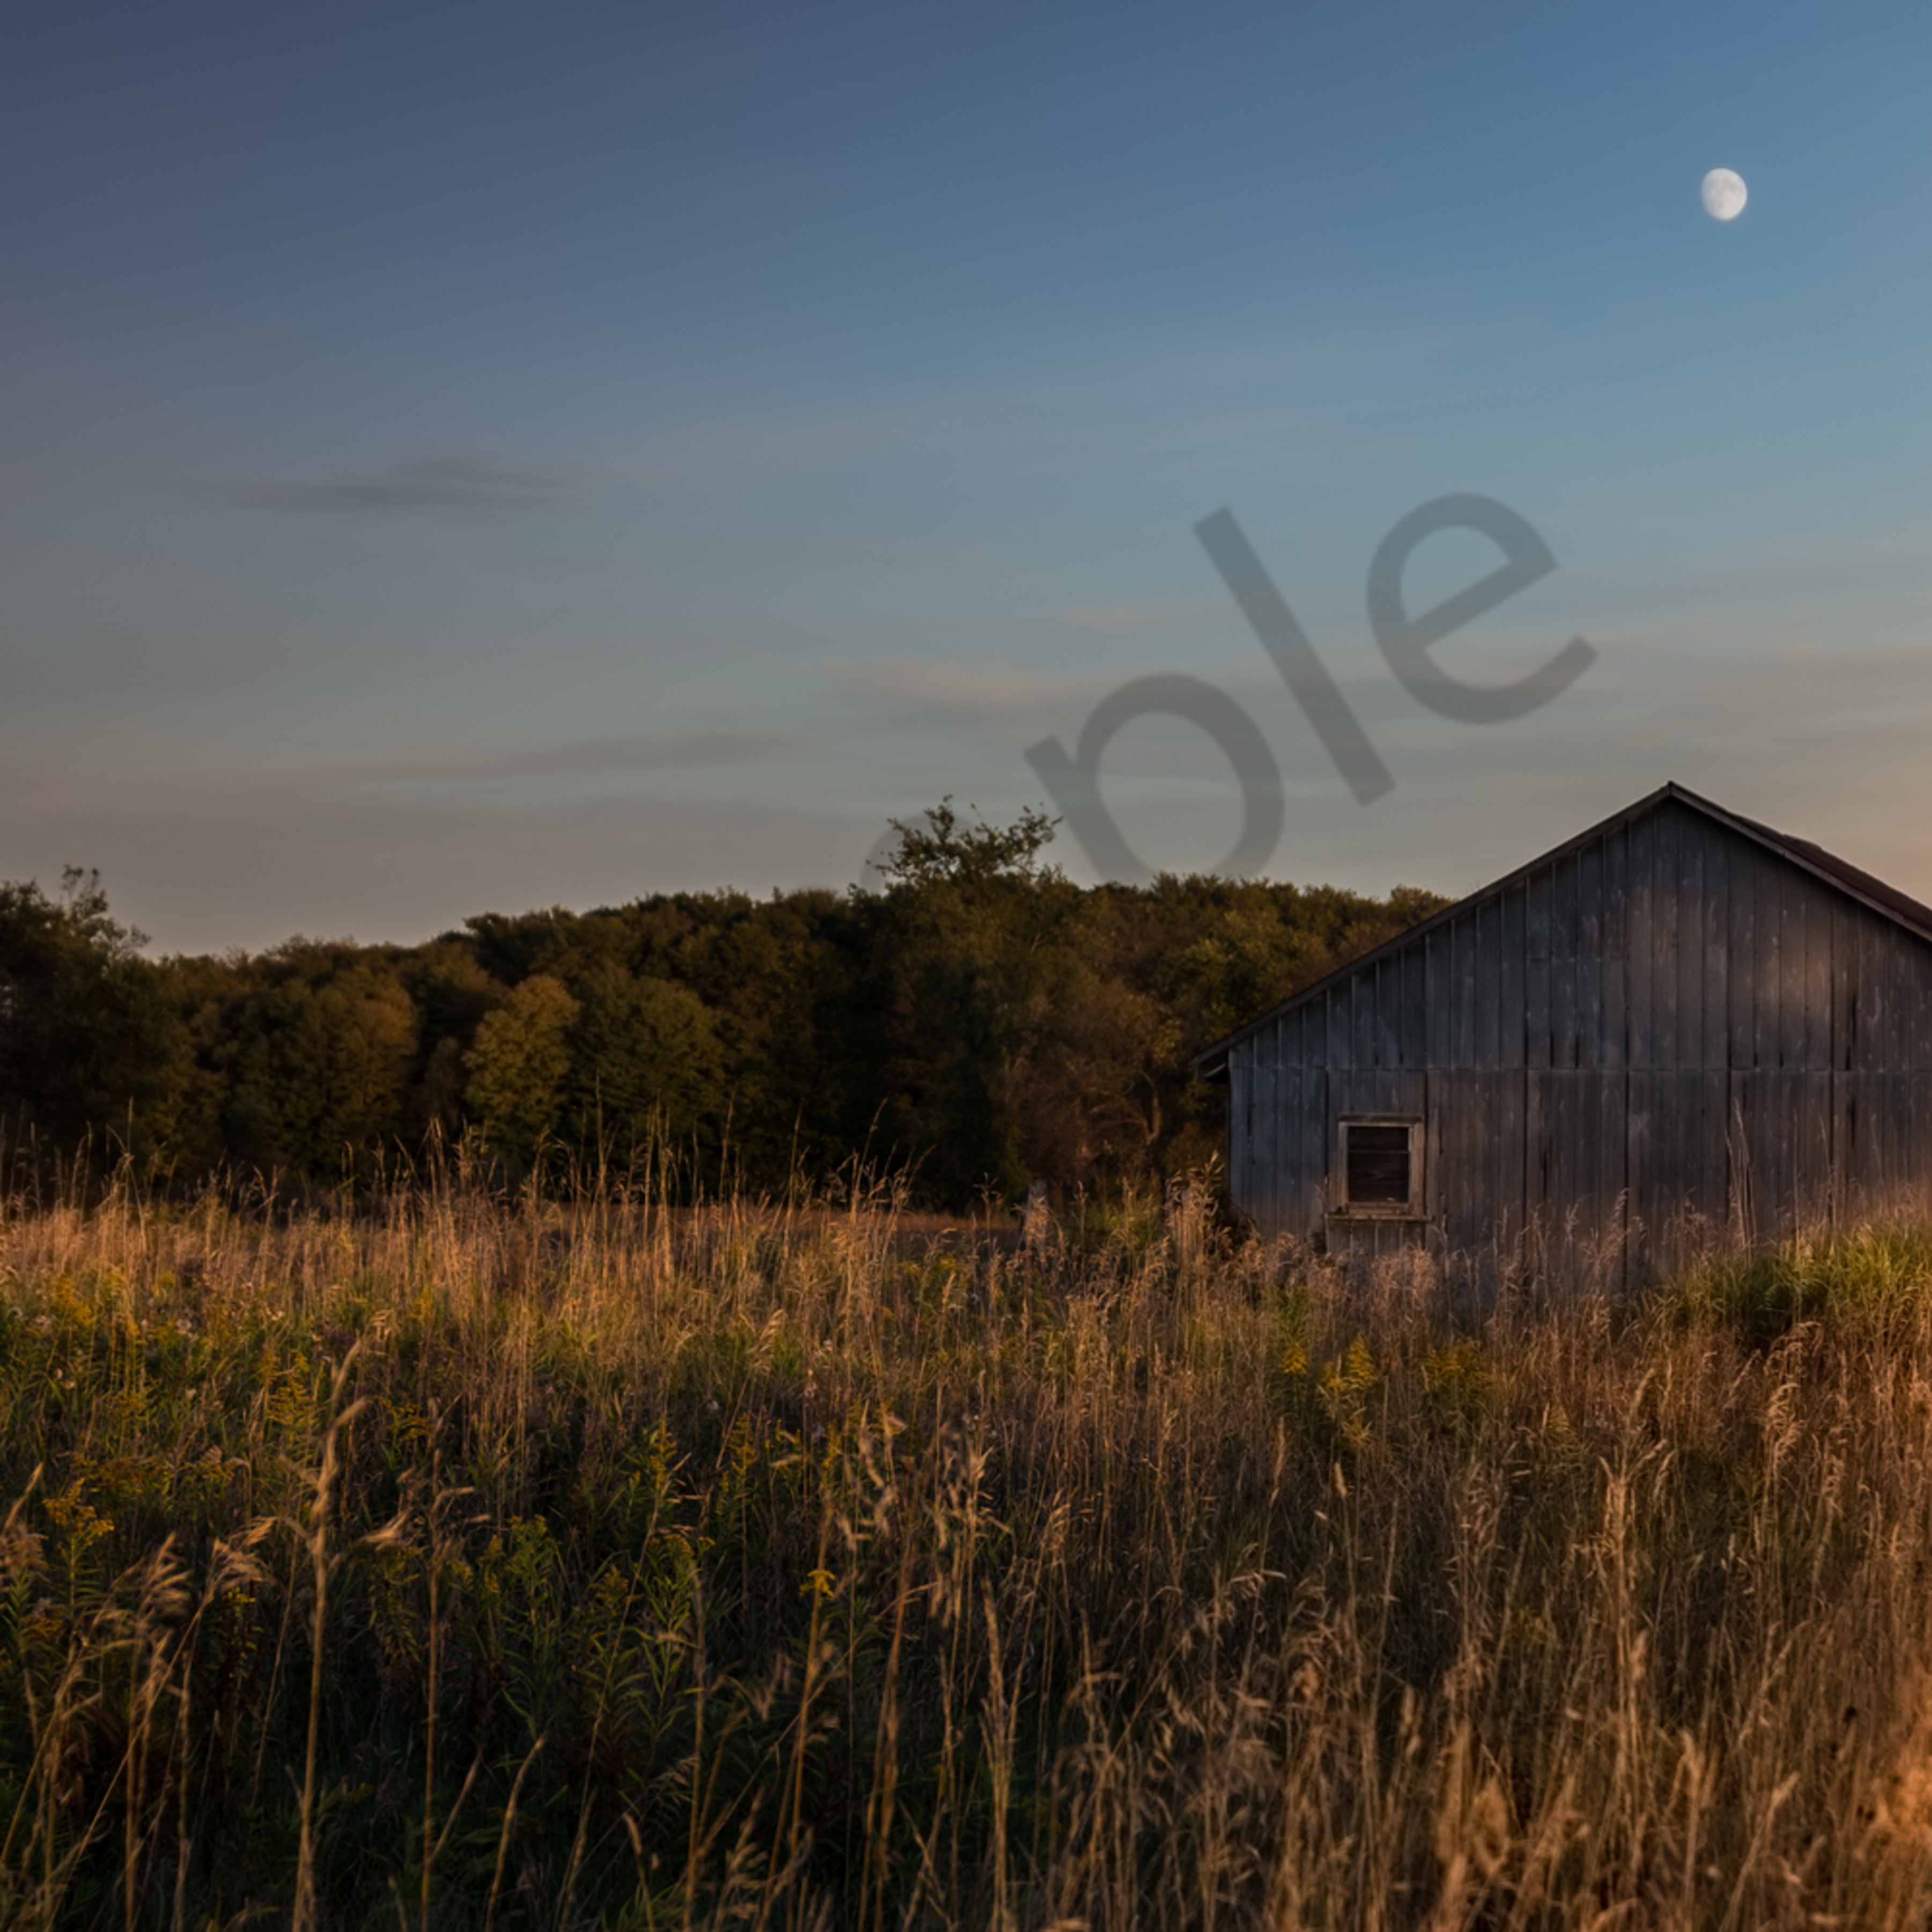 Barn and moon qjrbxf